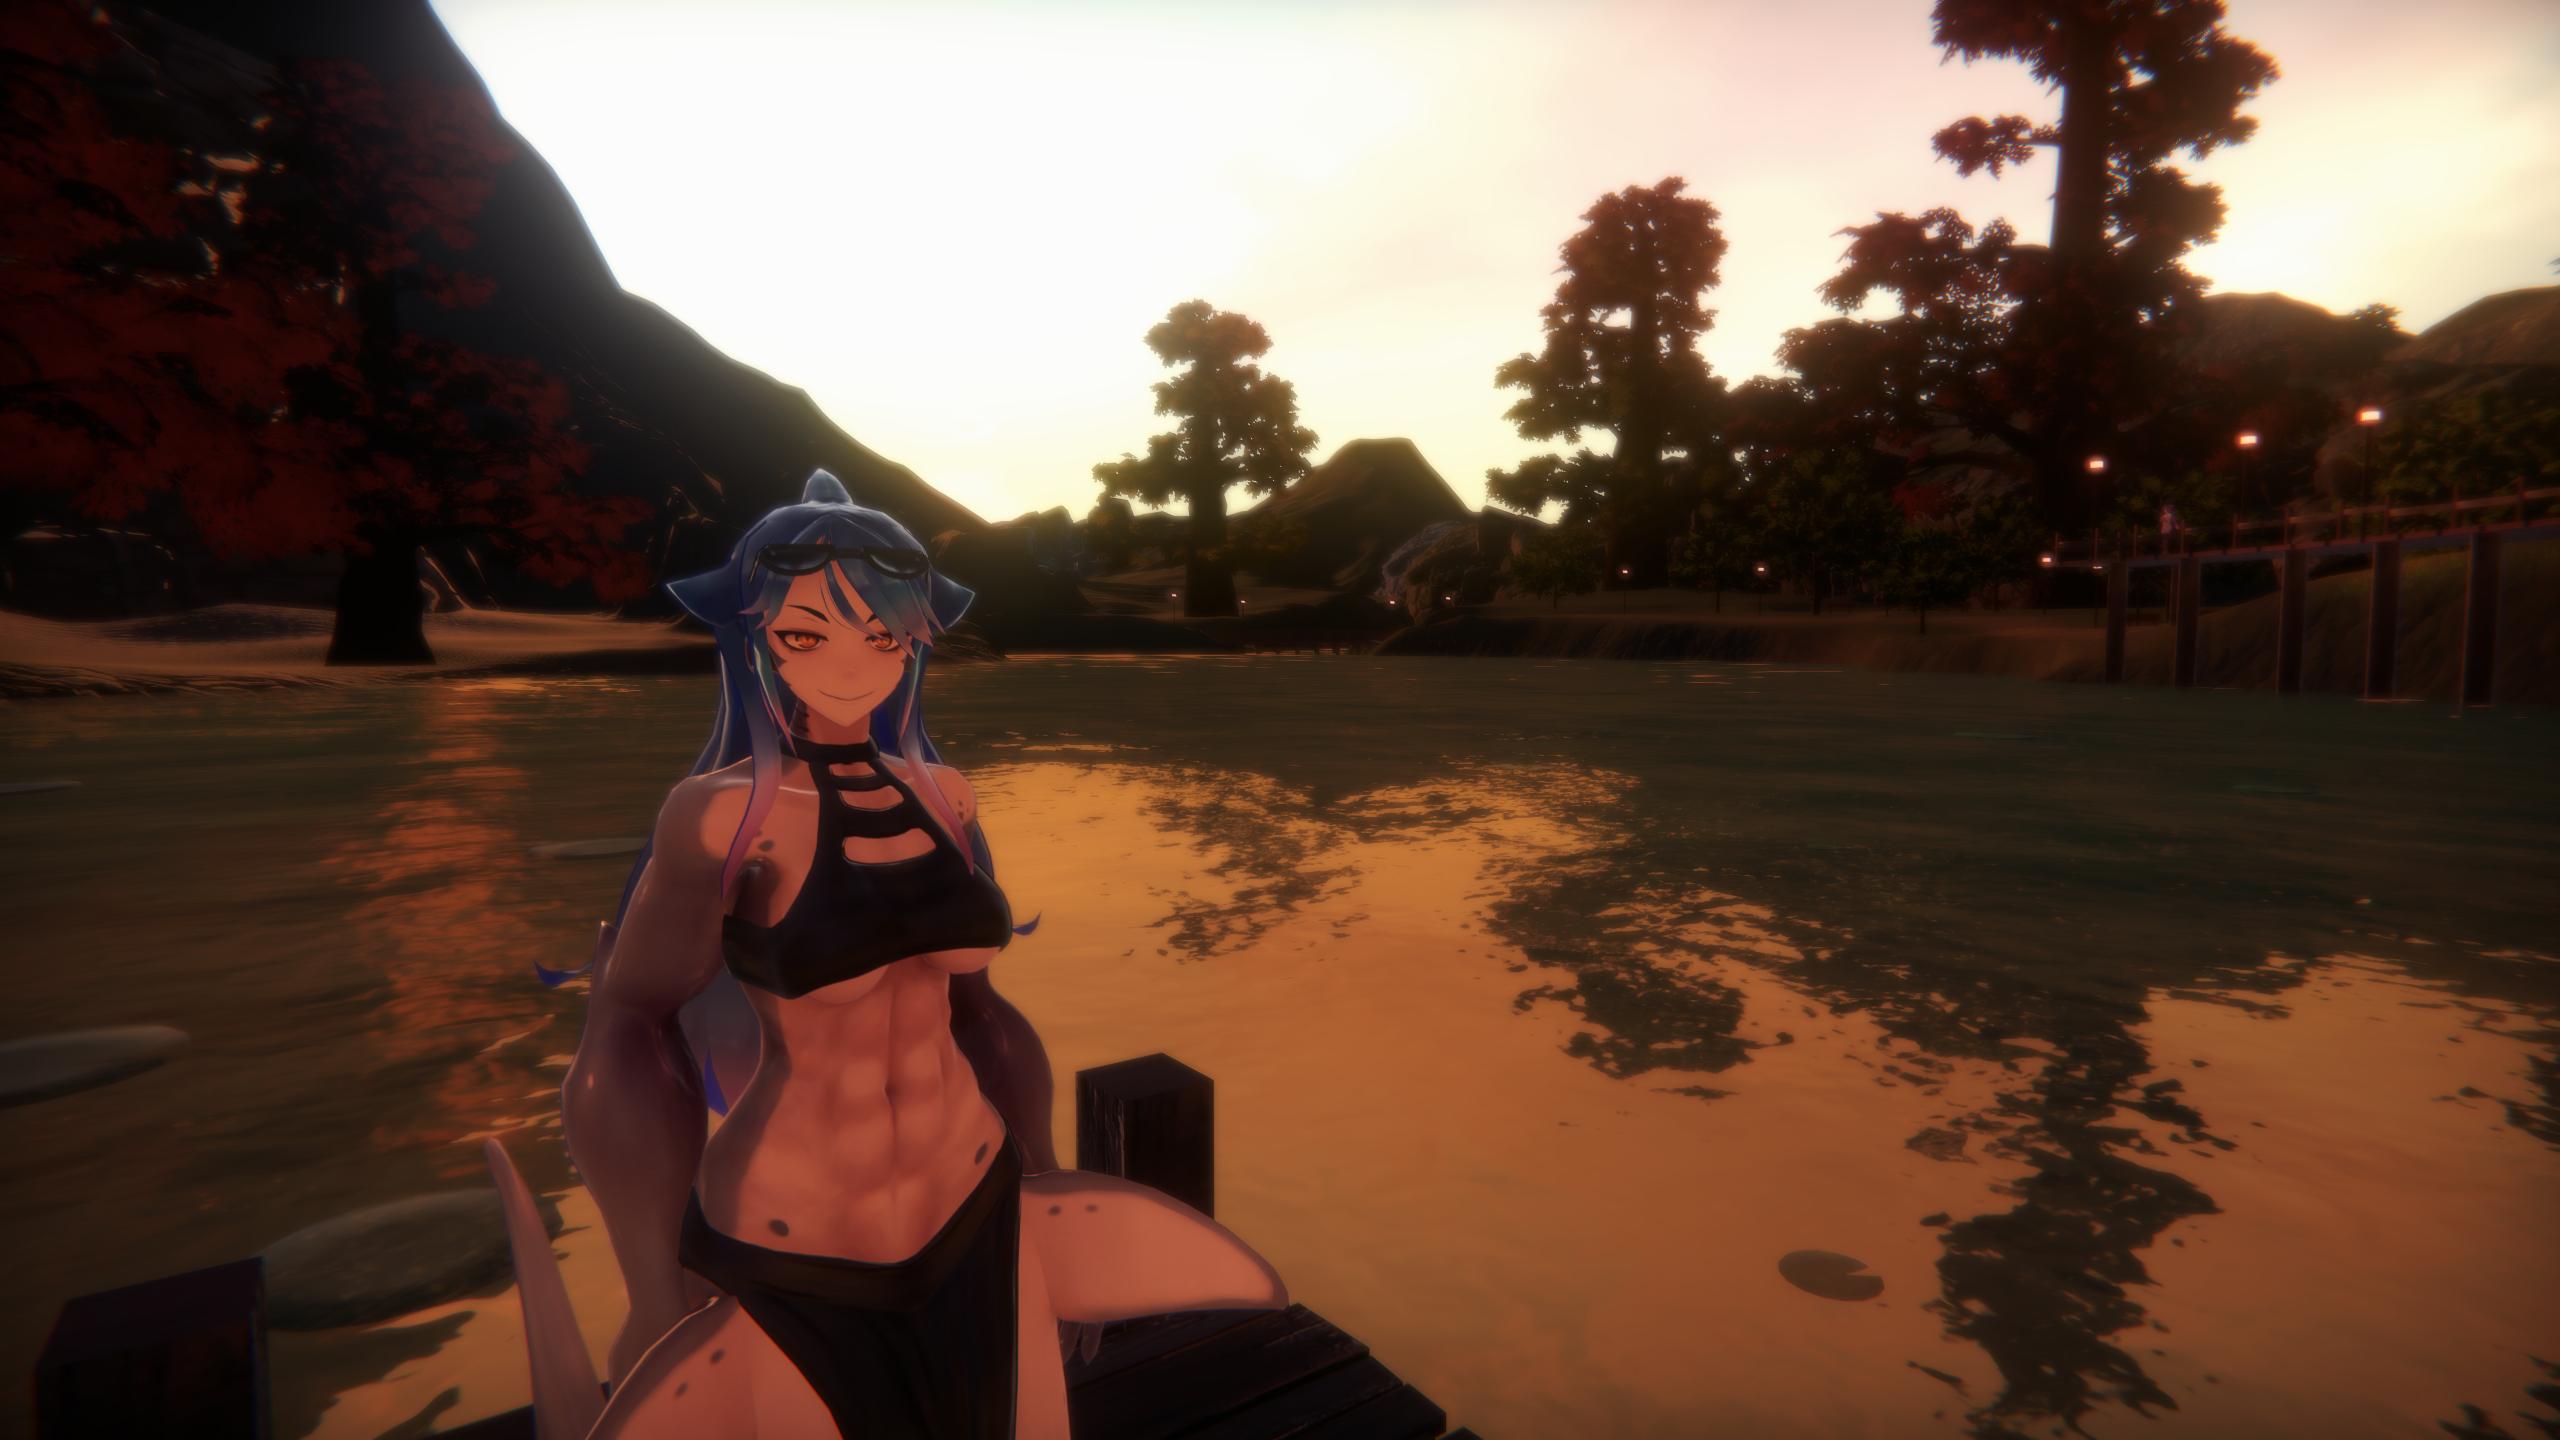 Download free monster girl island mako scene build